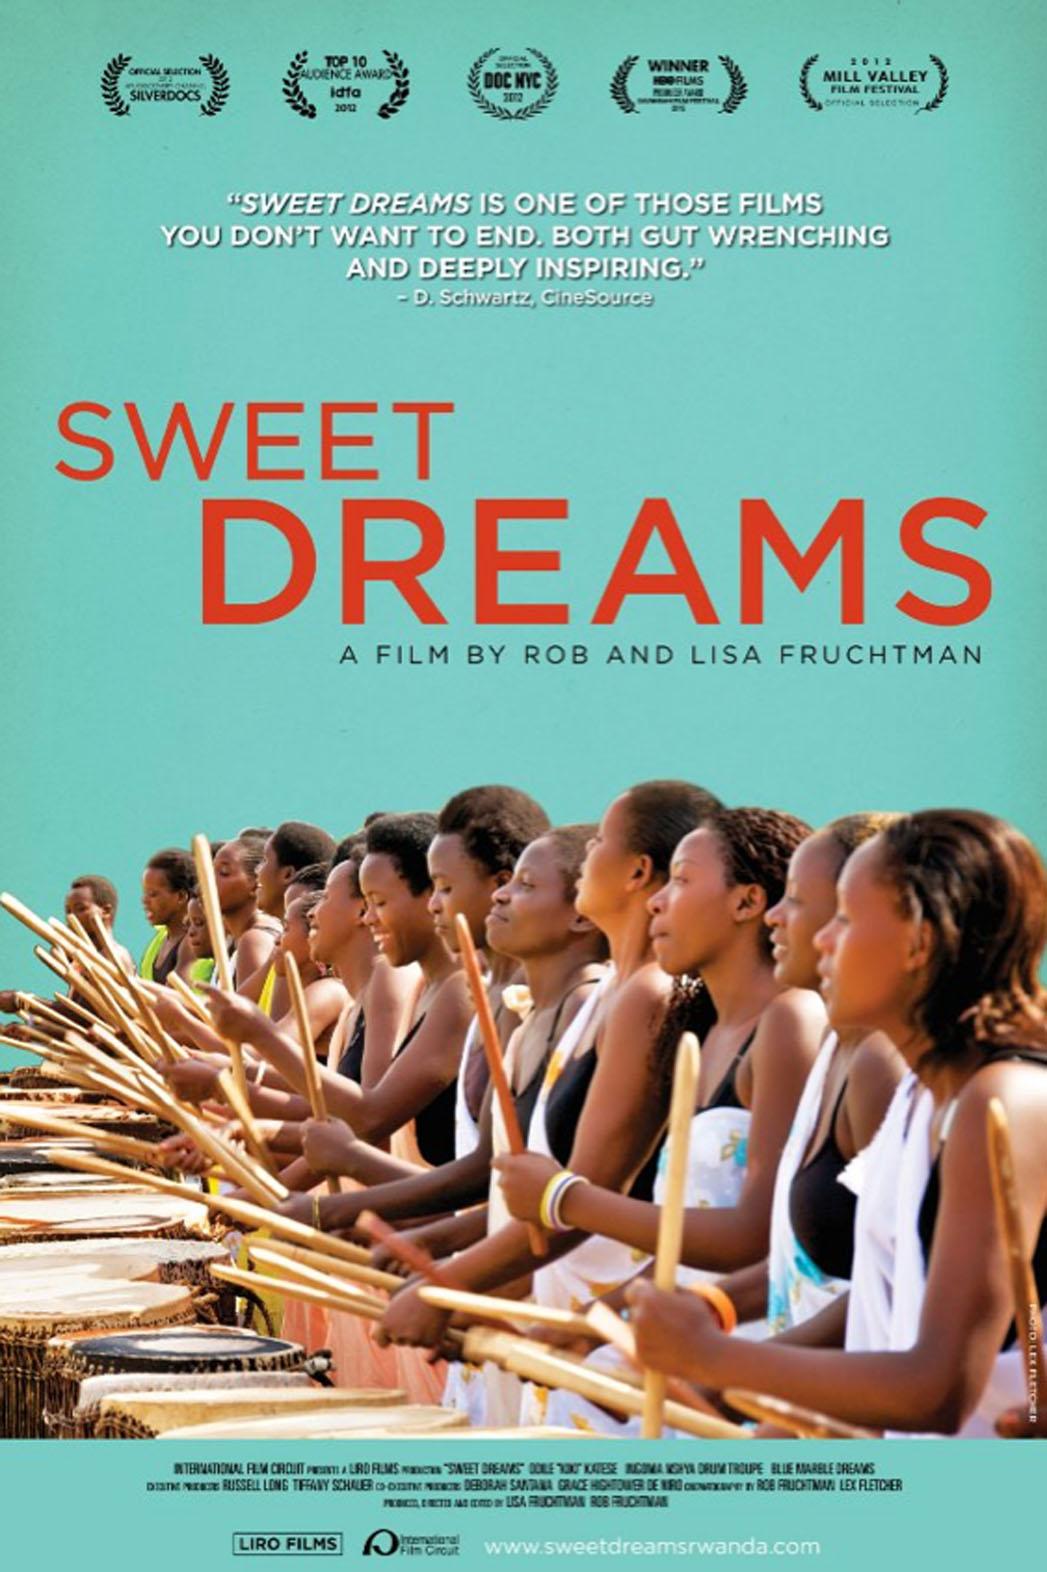 Sweet Dreams Poster Art - P 2013